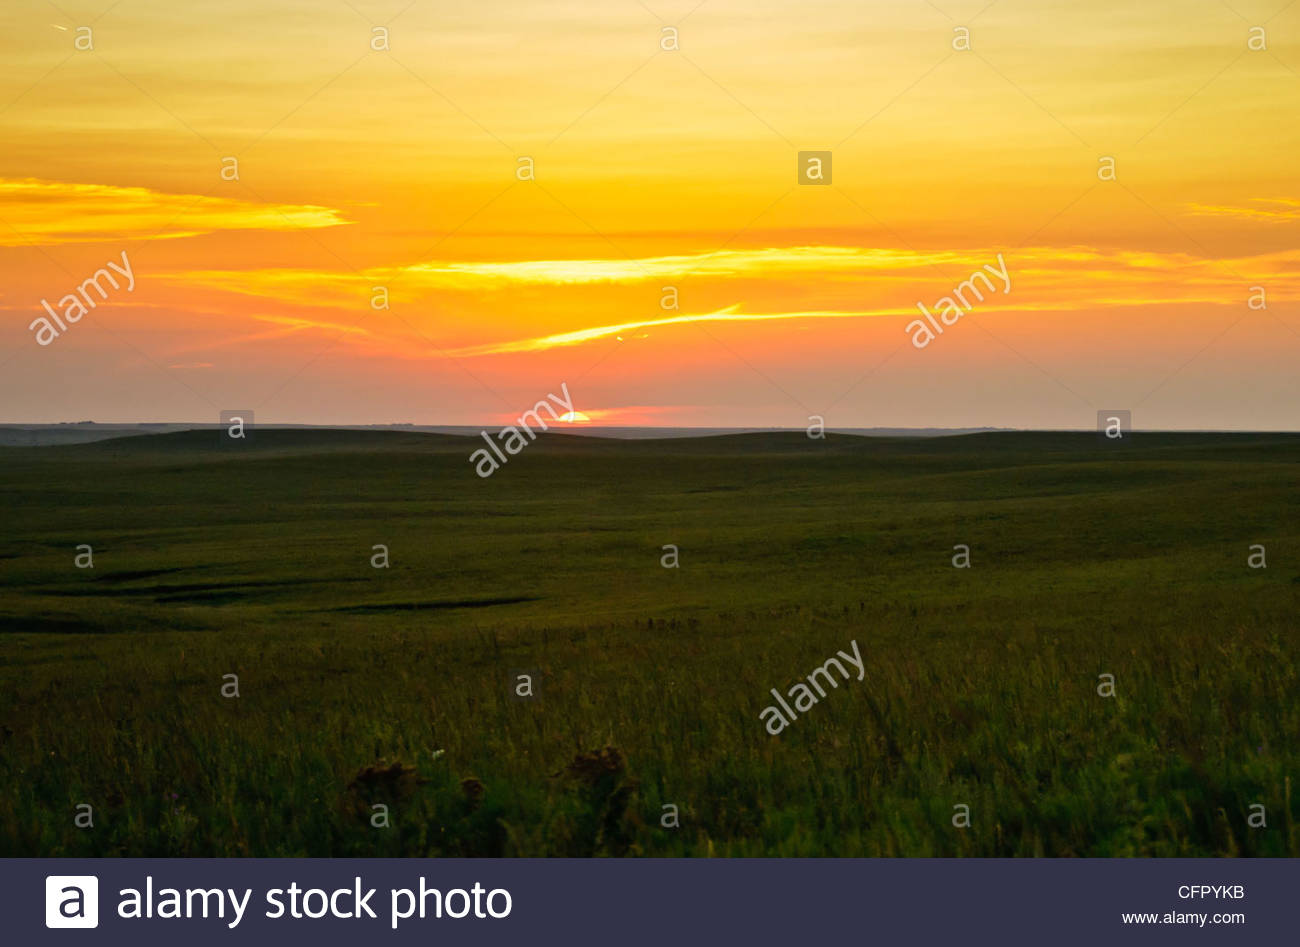 Flint Hills Sunset, Kansas Flint Hills, Cassoday, KS., Aug 23, 2008 - Stock Image